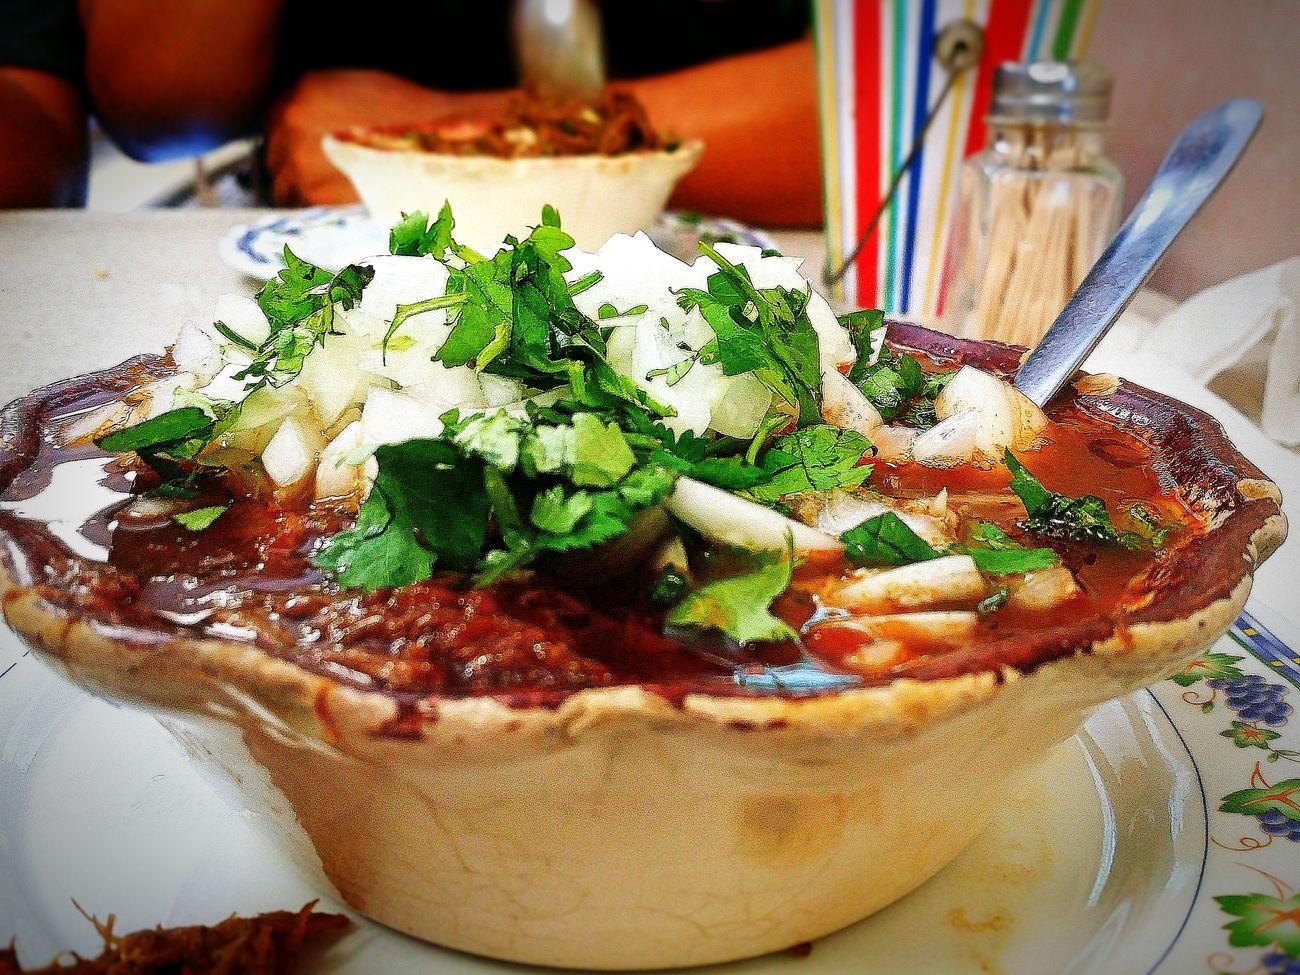 Mexican Food Tacos De Birria ✌❤ Birra Mexicali Baja California Taking Photos Enjoying Life Foodphotography Bajacalifornia Famliy1st!!! Fambam